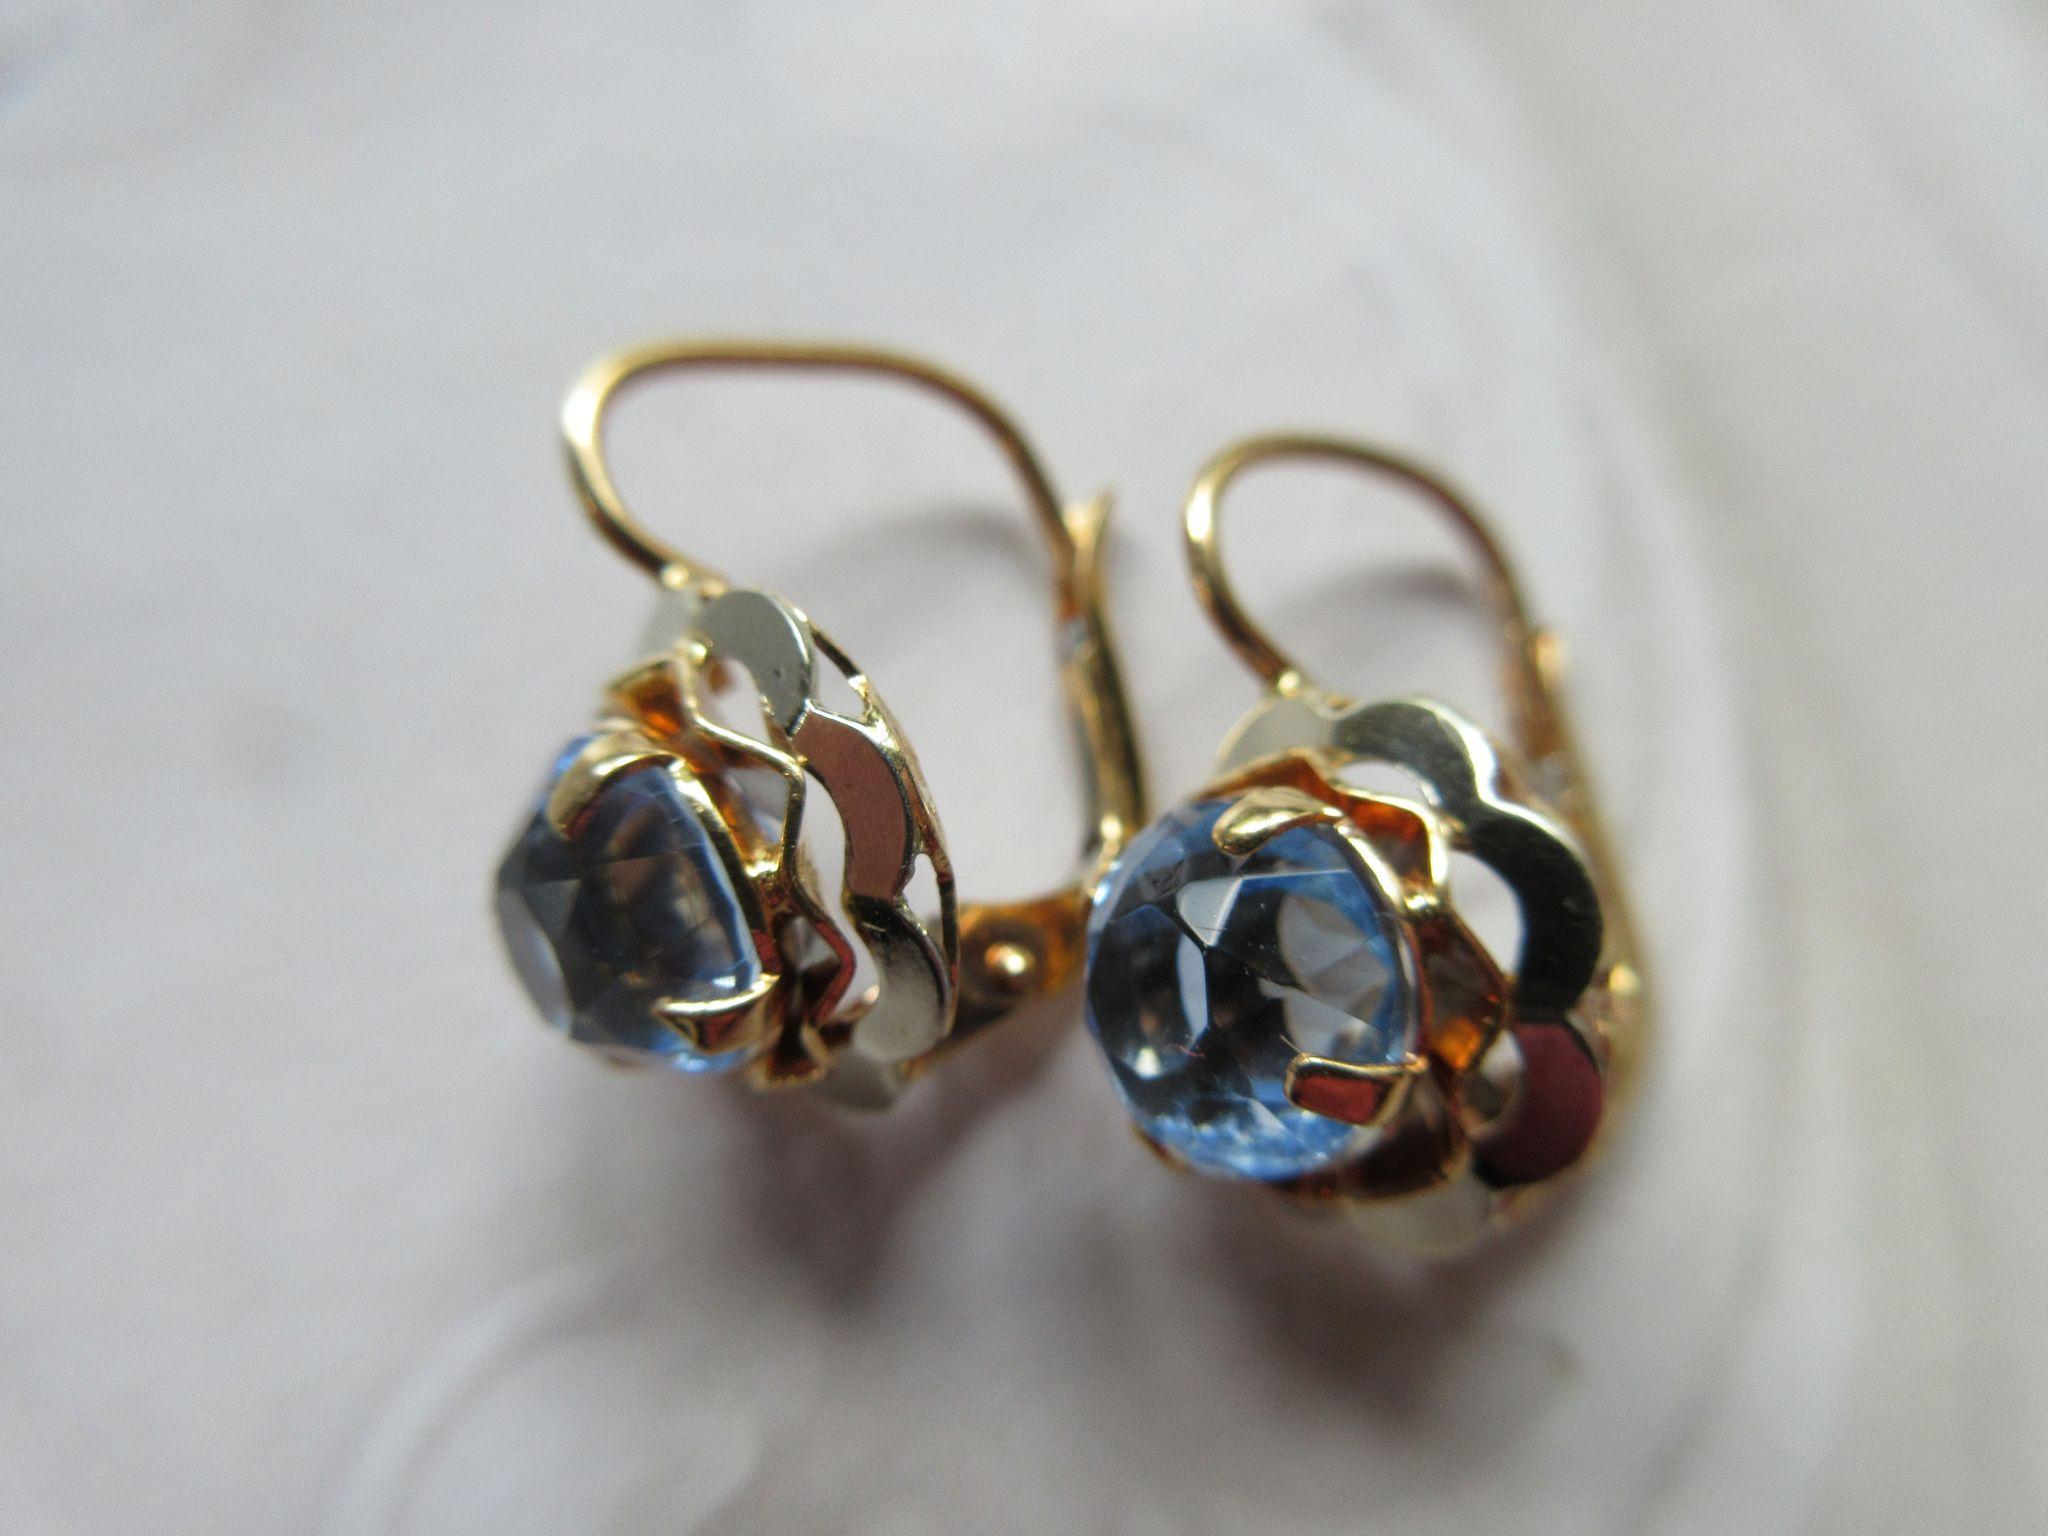 Older Vintage Faceted Blue Paste Pierced Earrings in Gold Fill